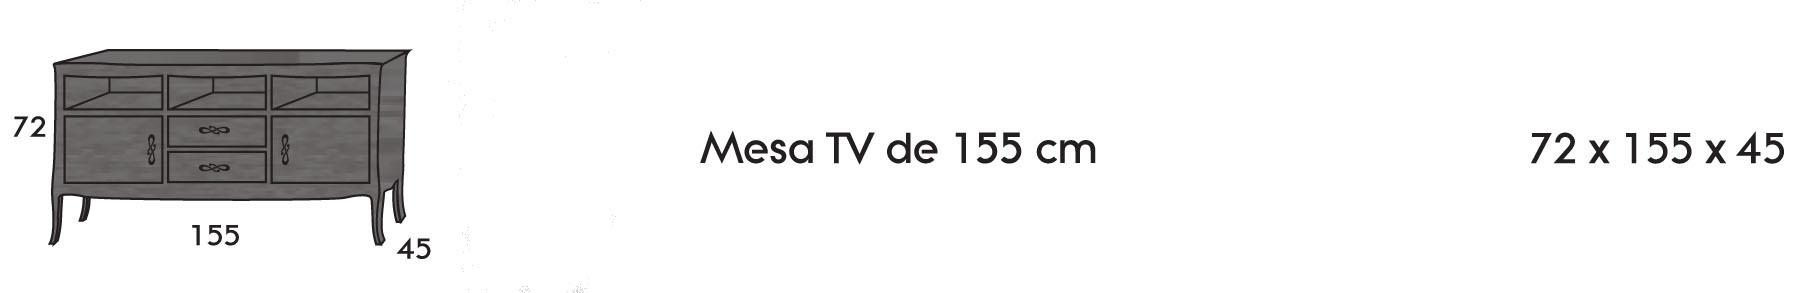 Mesa TV 155